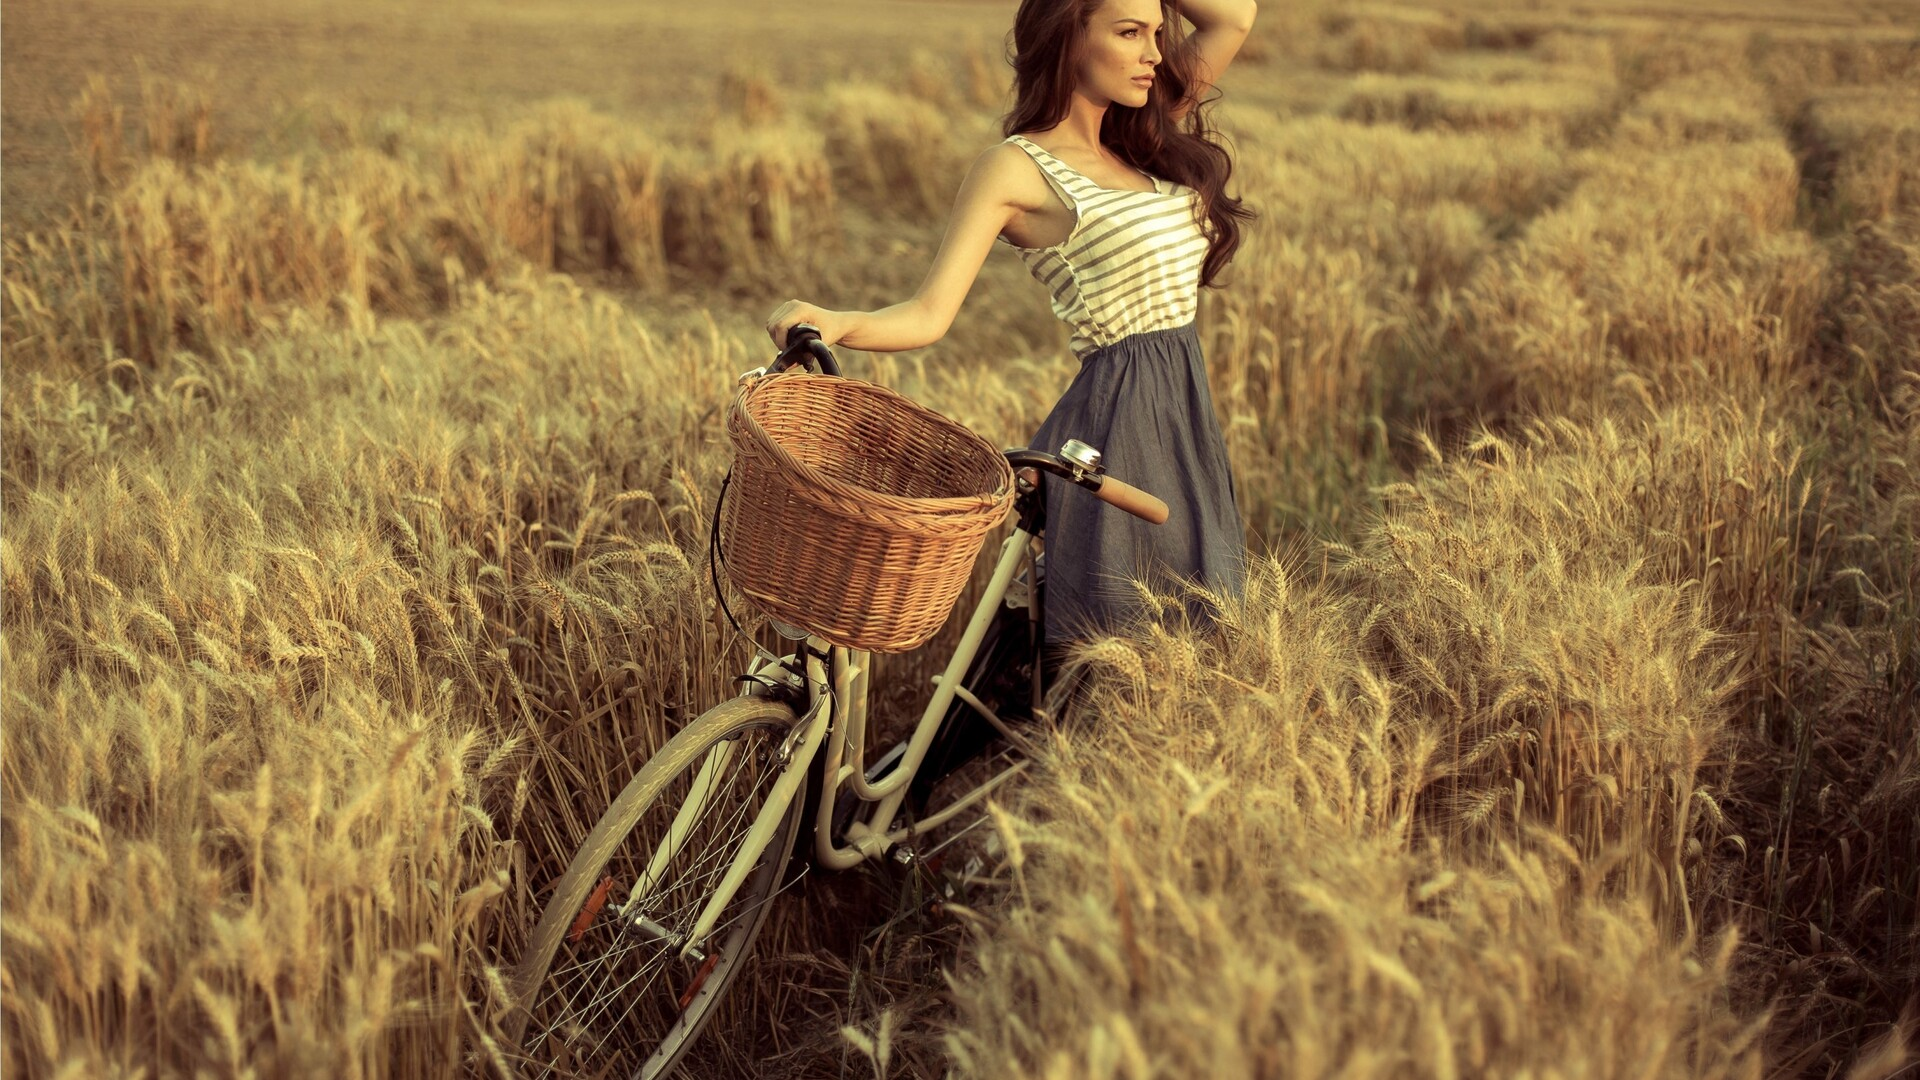 1920x1080 Cute Girl With Cycle Laptop Full HD 1080P HD 4k